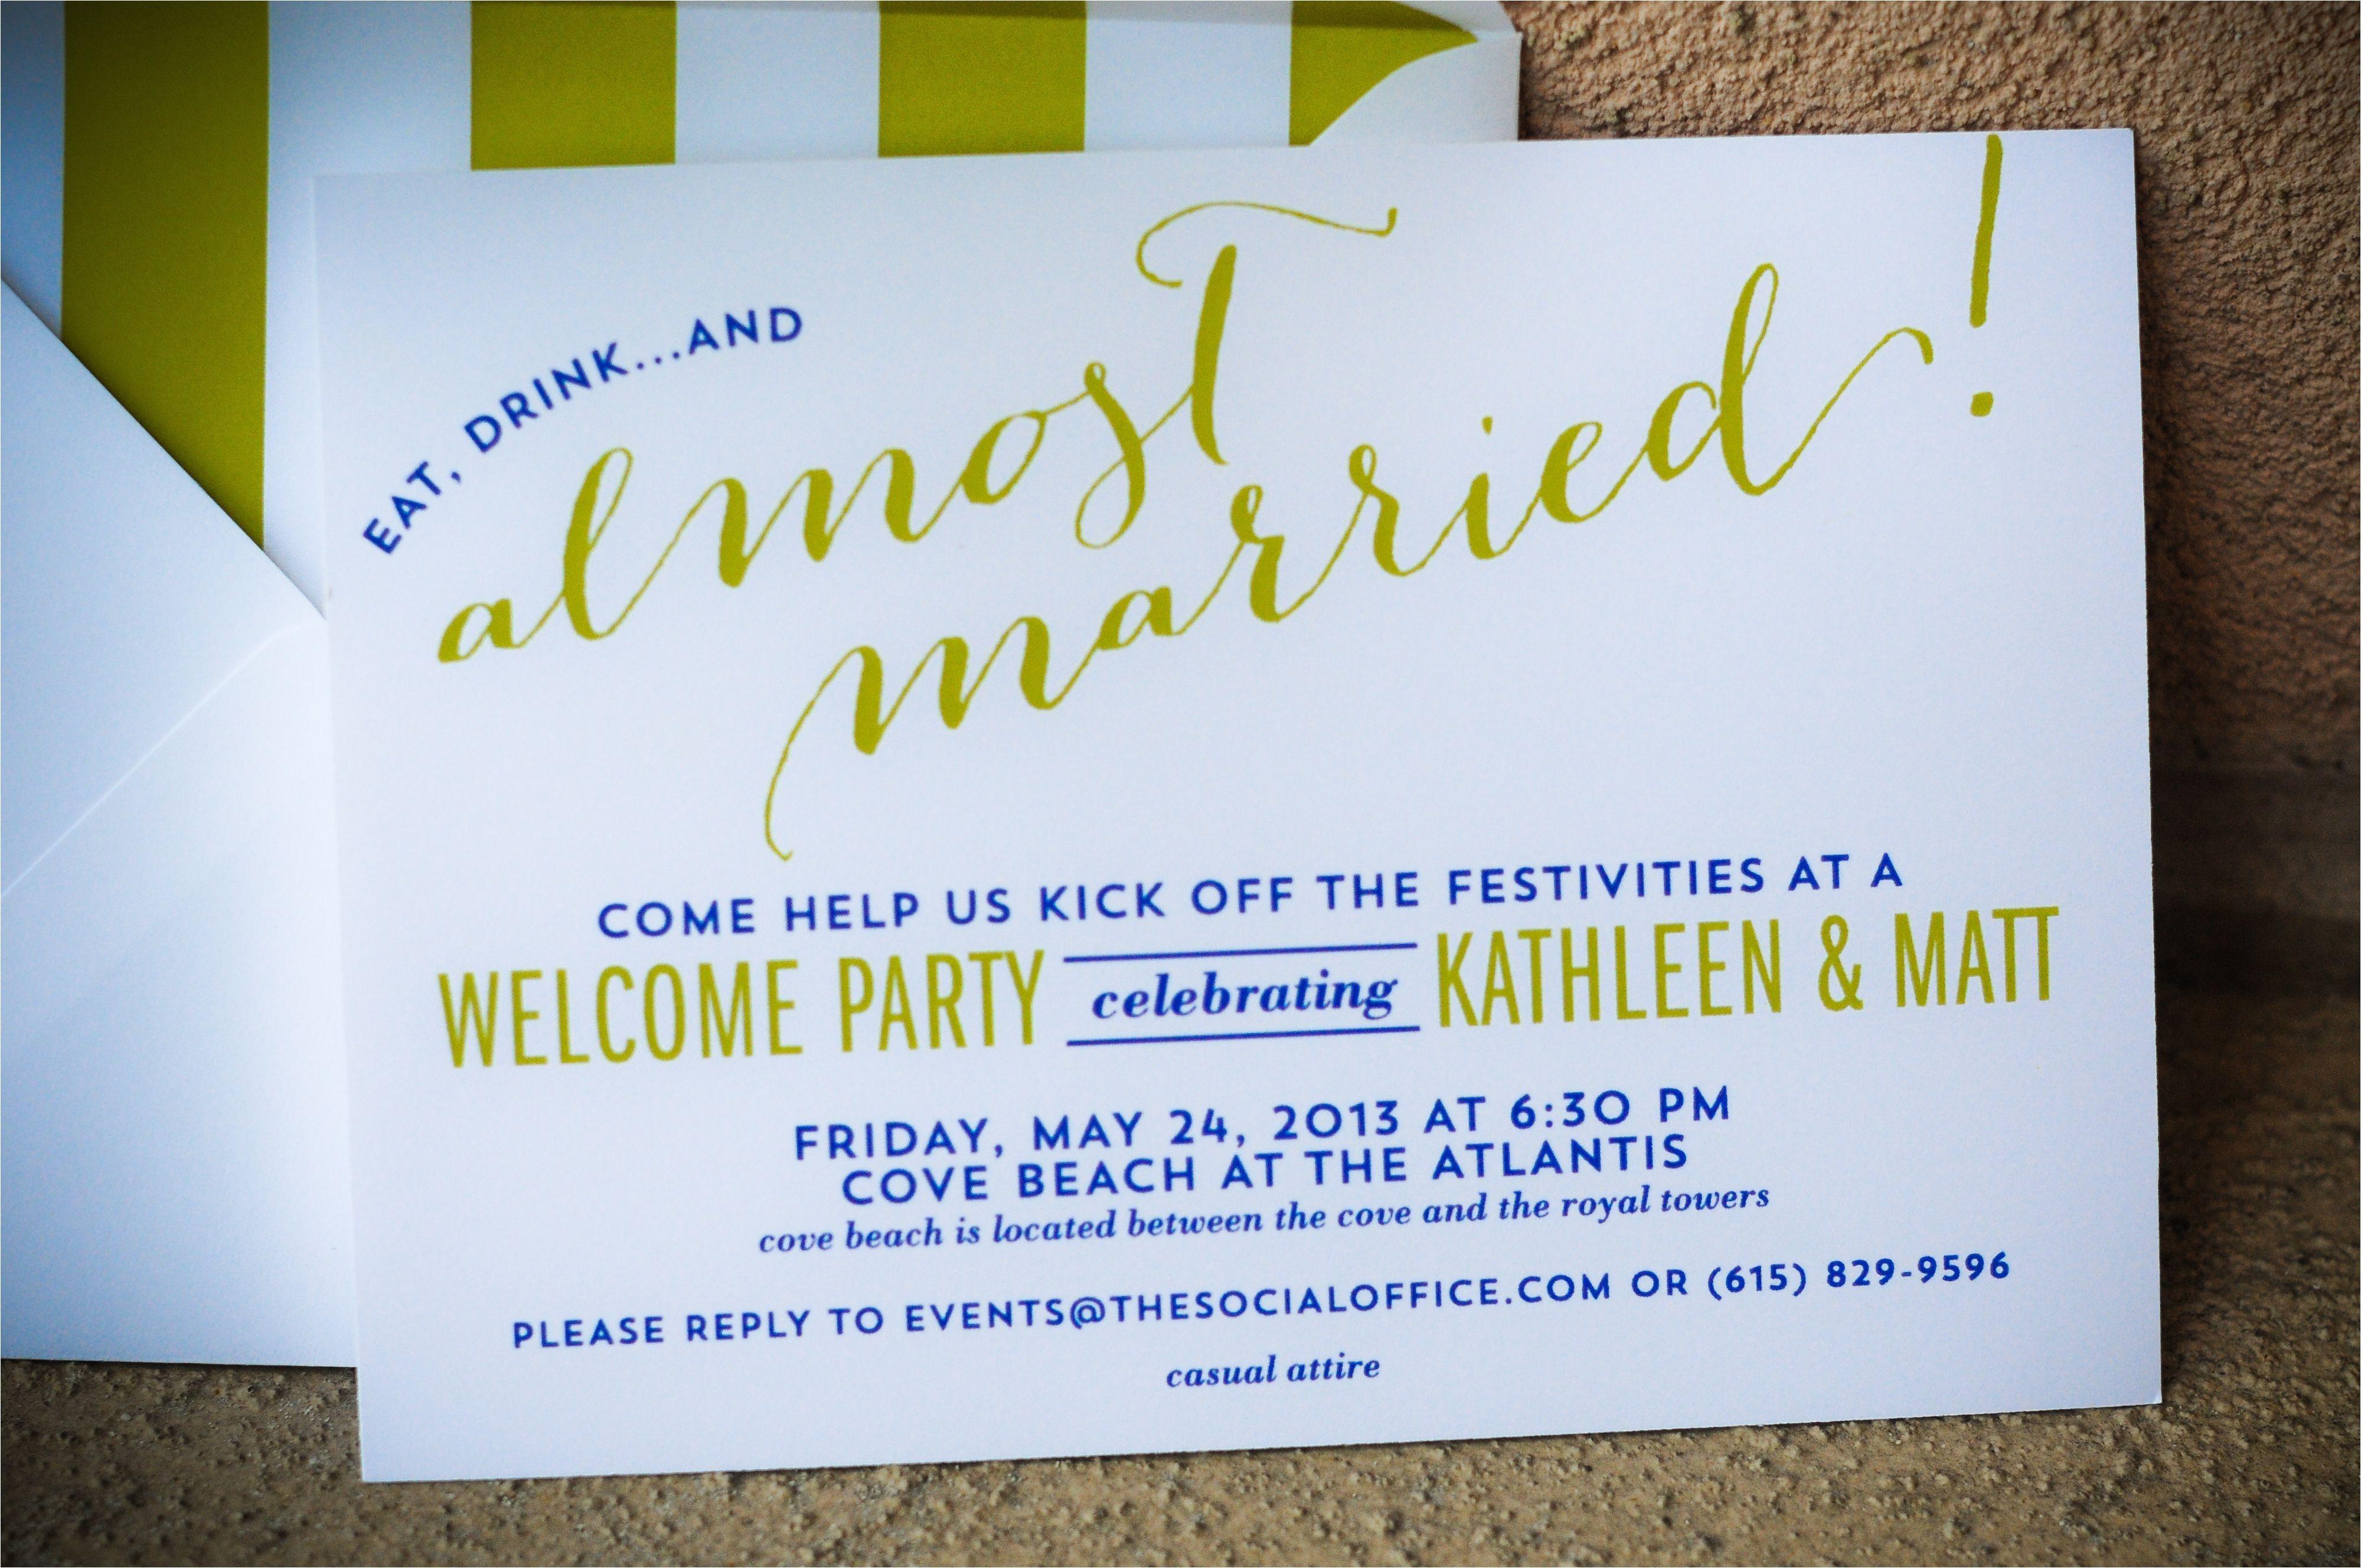 Wedding Welcome Party Invitation Bahamas Wedding Wel E Party Invitations I Custom by Nico